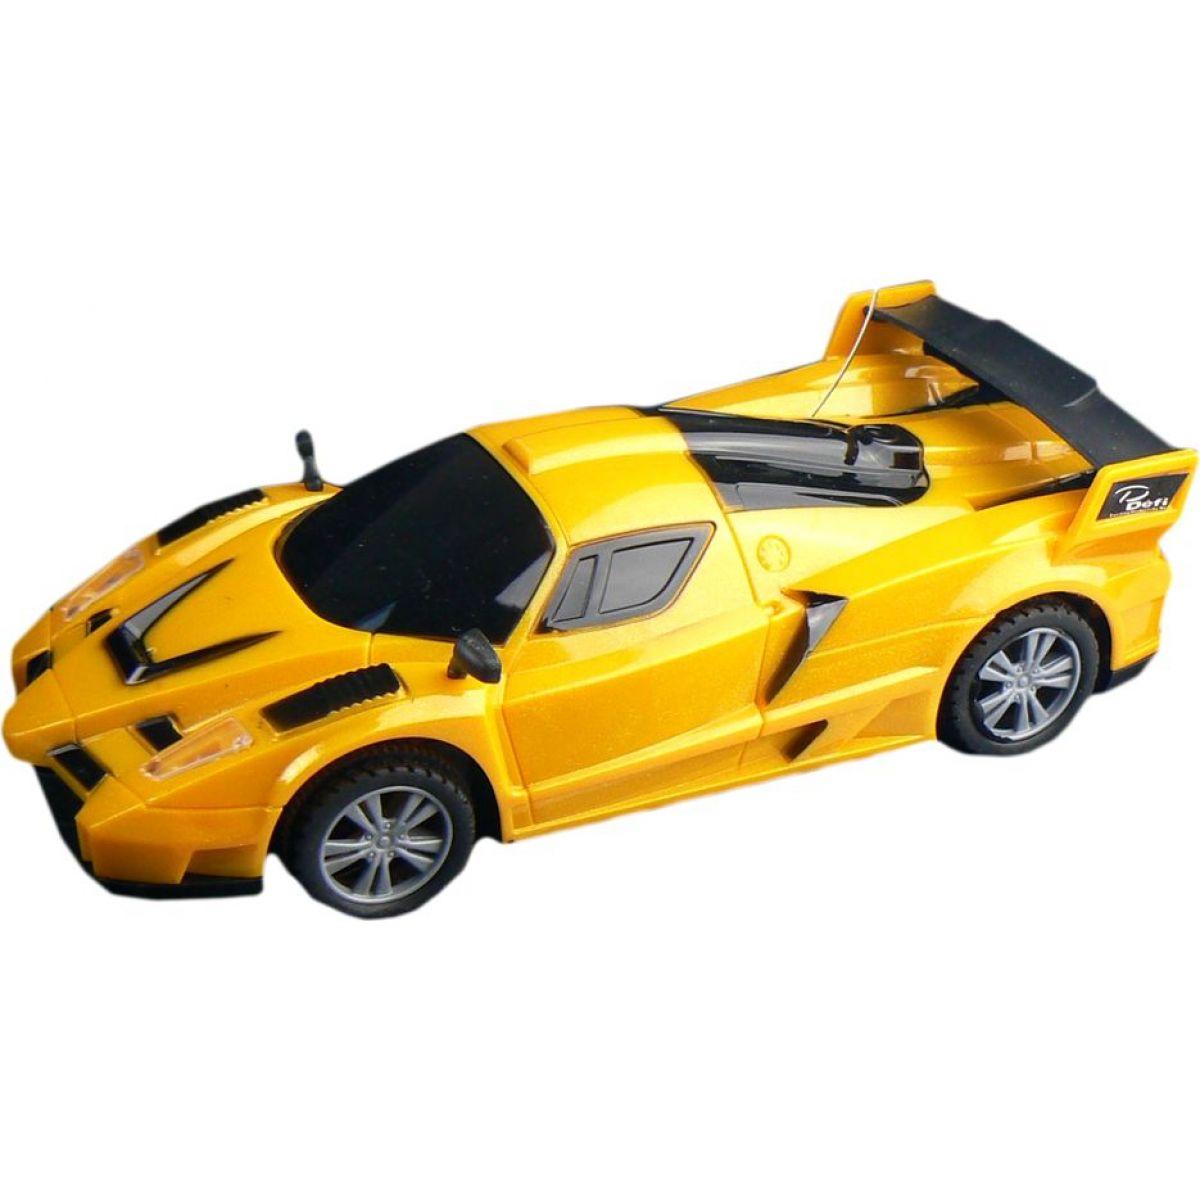 Dromader RC Auto Racing Žluté s tmavými skly